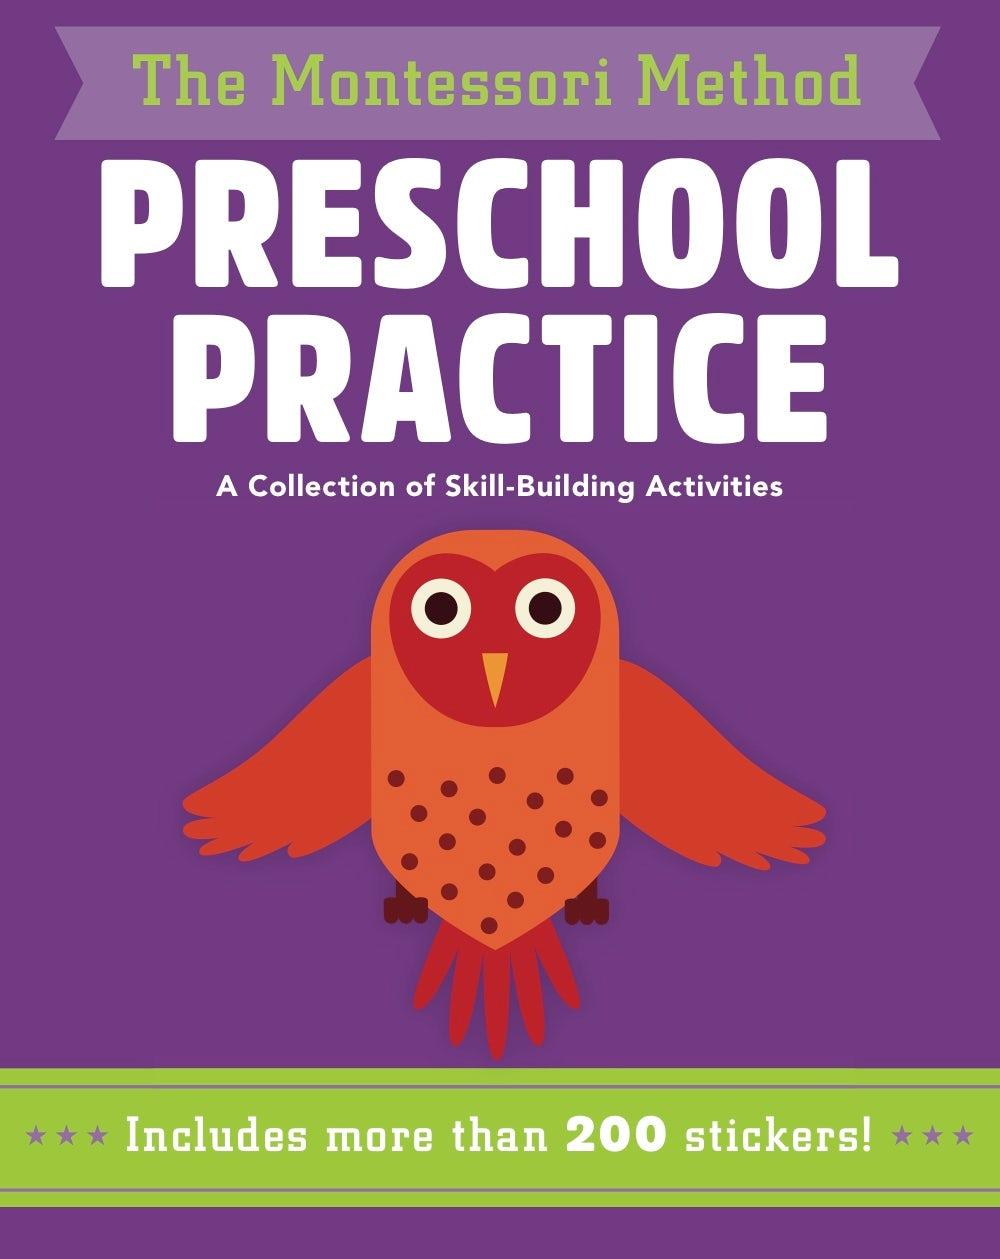 The Montessori Method Book